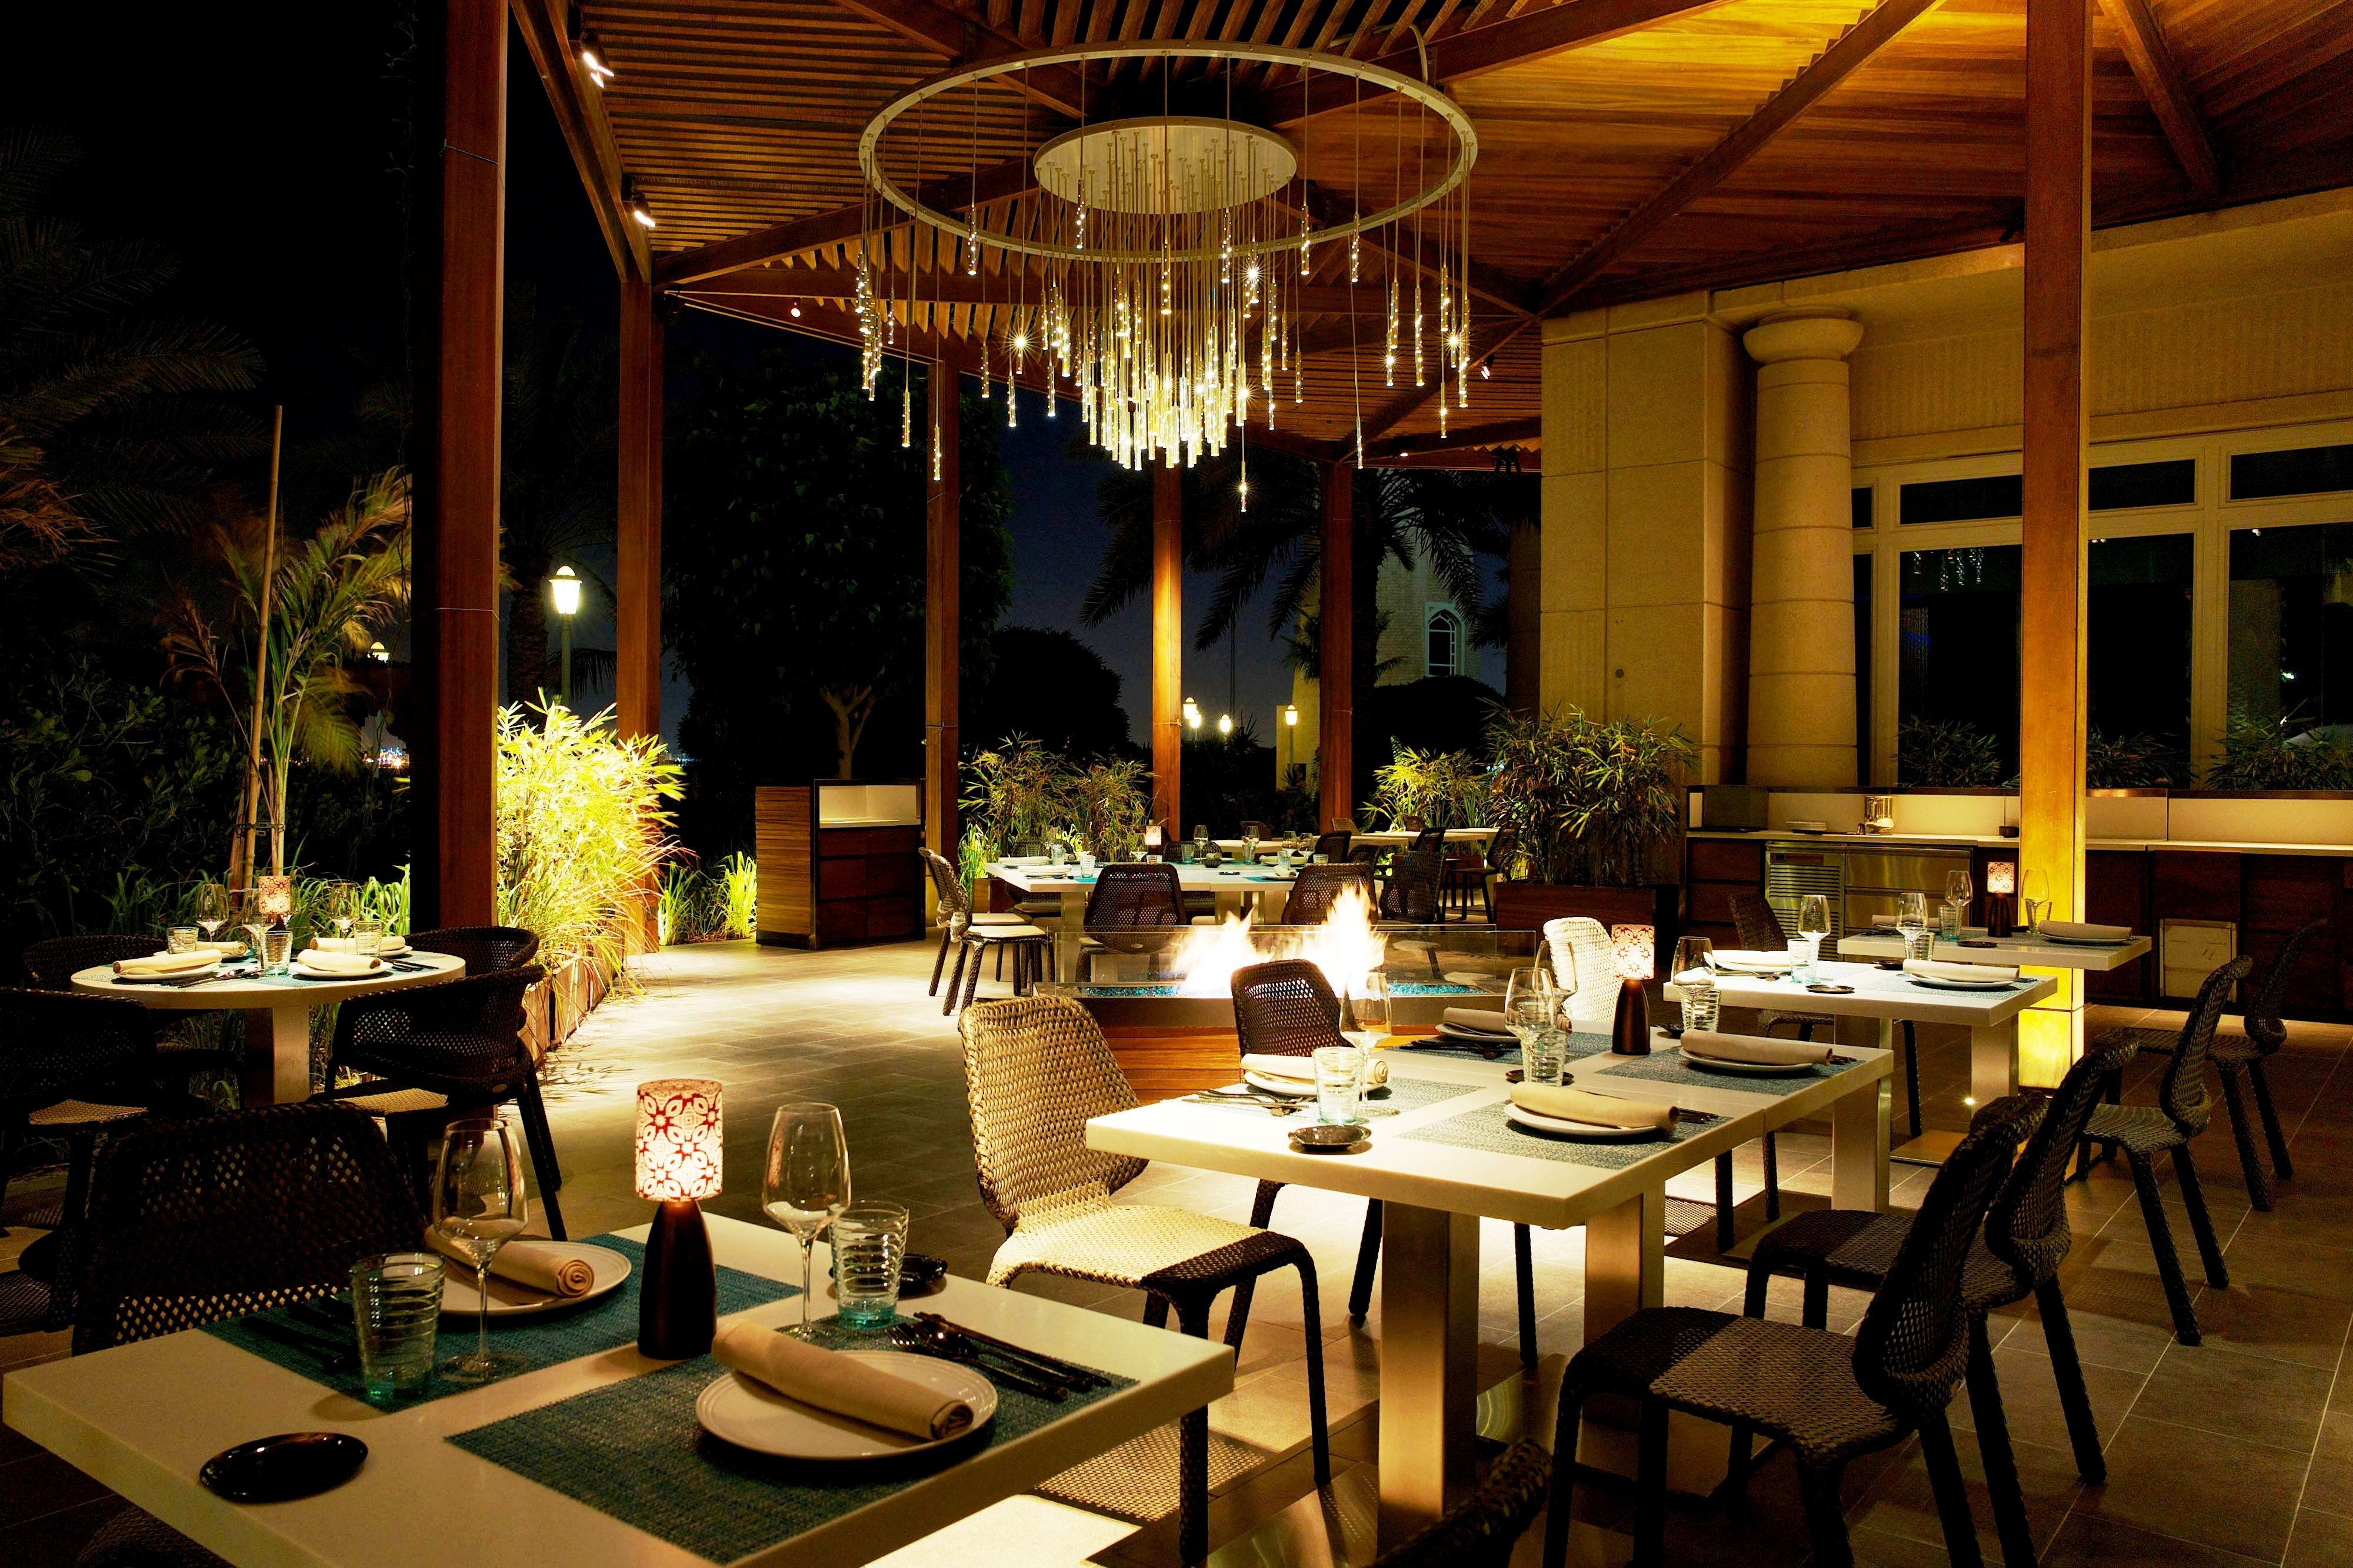 Www Neoz Com Neoz Cordless Lamp neoz owl custom cordless lamp at nusantao terrace, four